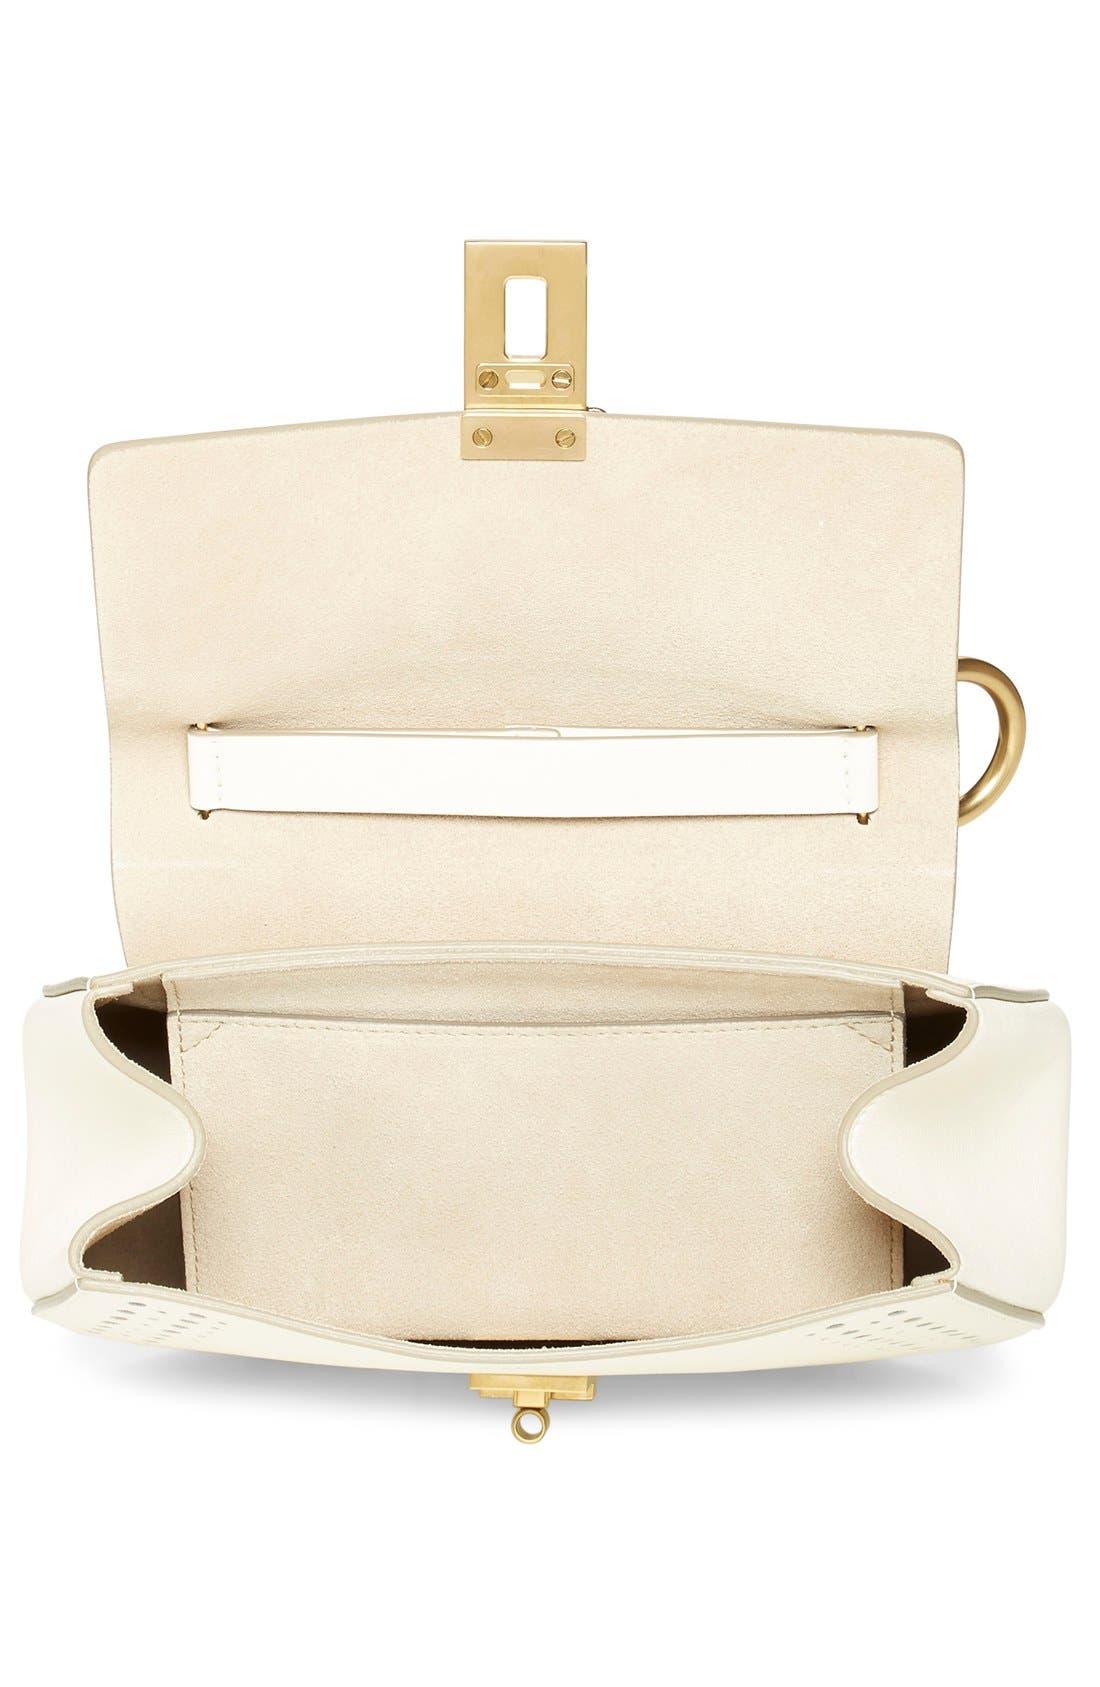 'Mini Drew' Calfskin Leather Shoulder Bag,                             Alternate thumbnail 4, color,                             100